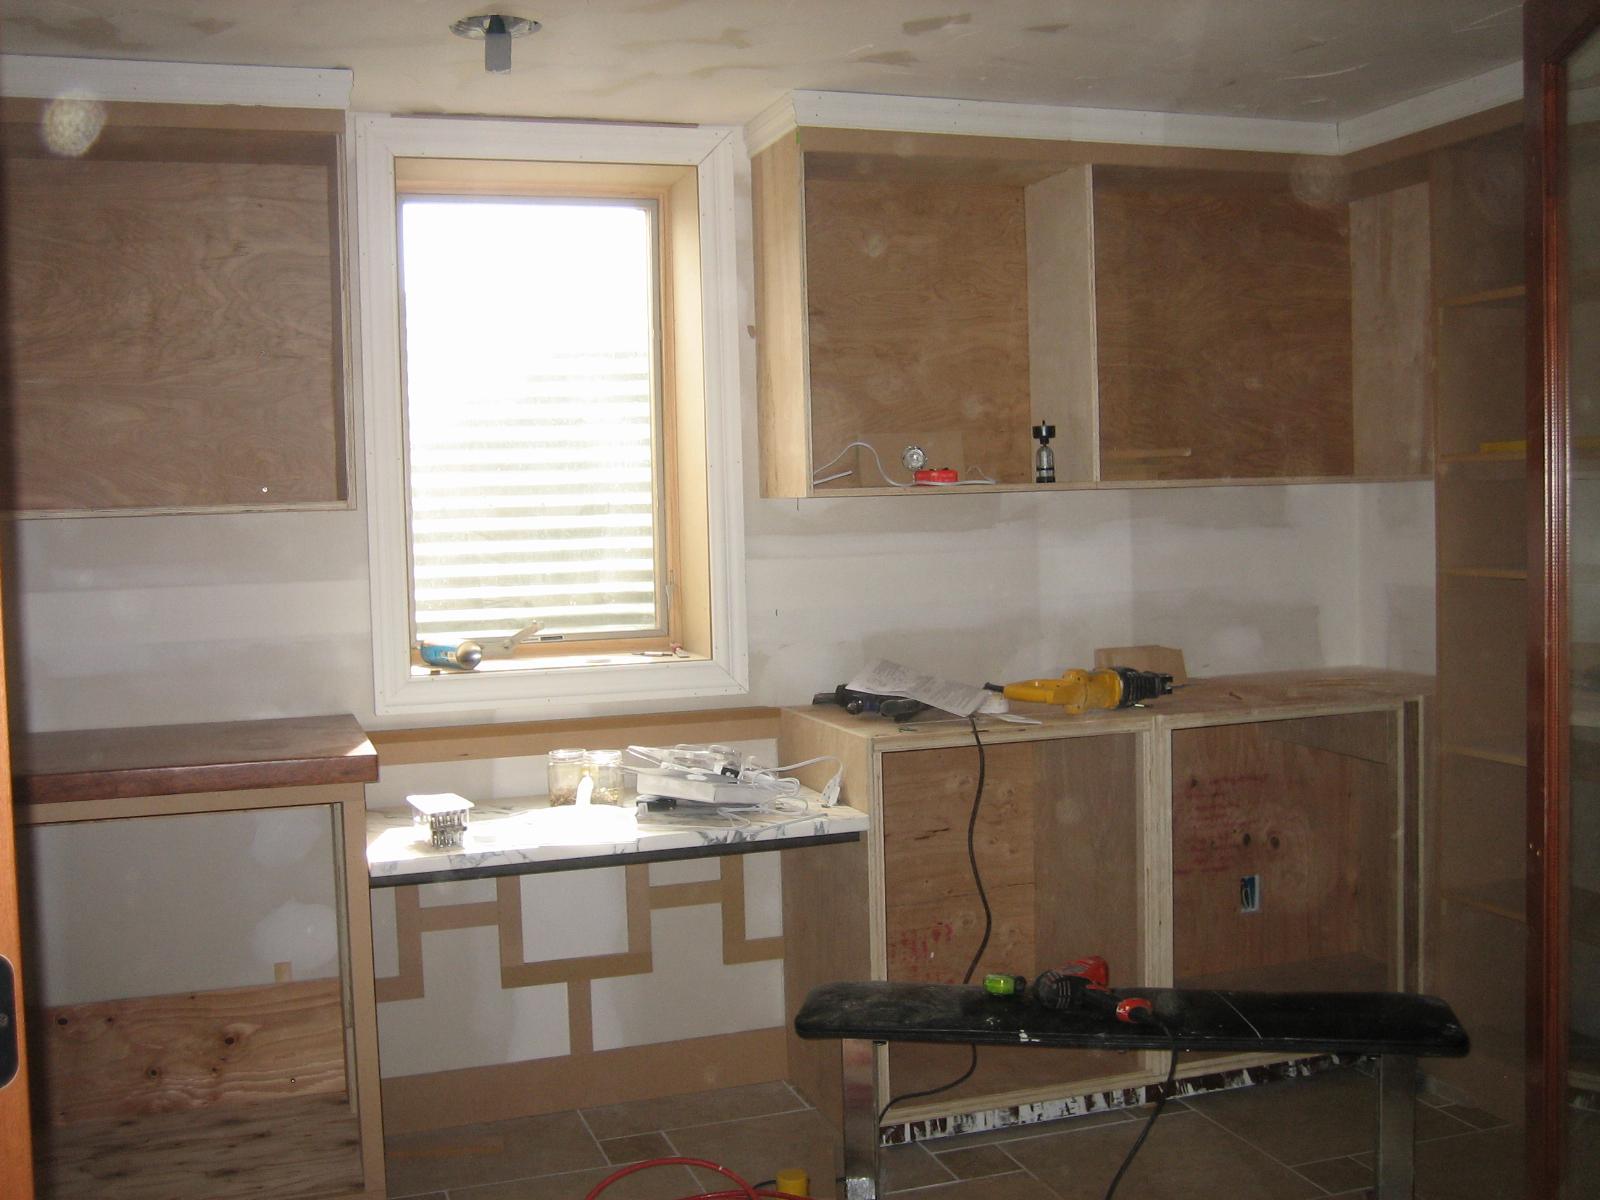 Rona Kitchen Cabinets Kitchen Stove Dimensions Standard With Modern Kitchen Design Photo